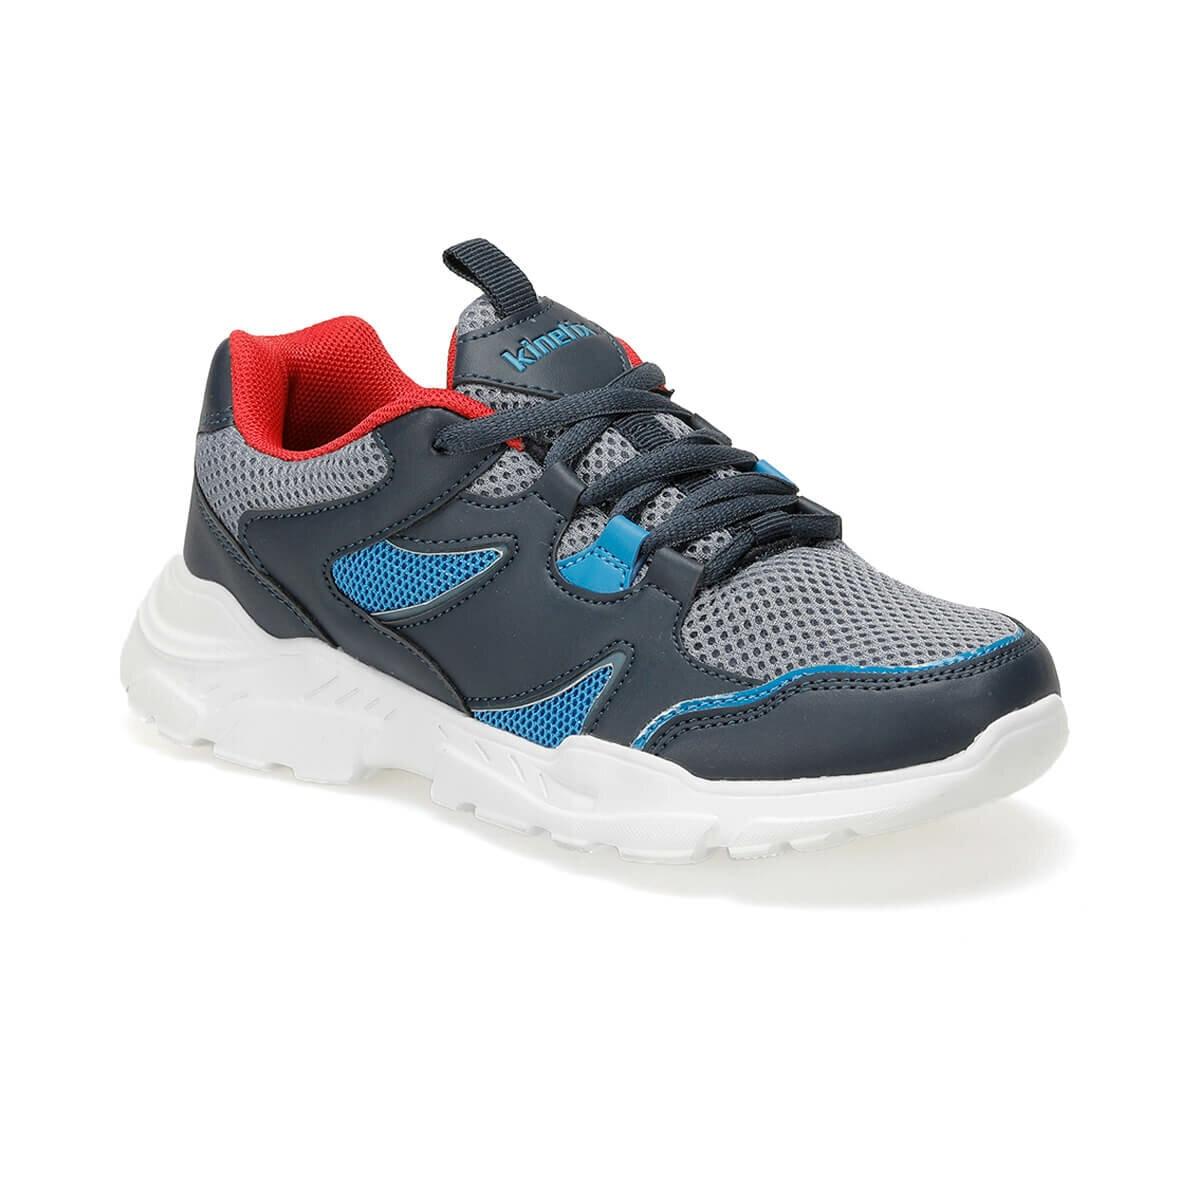 FLO SANDRA 9PR Navy Blue Male Child Hiking Shoes KINETIX